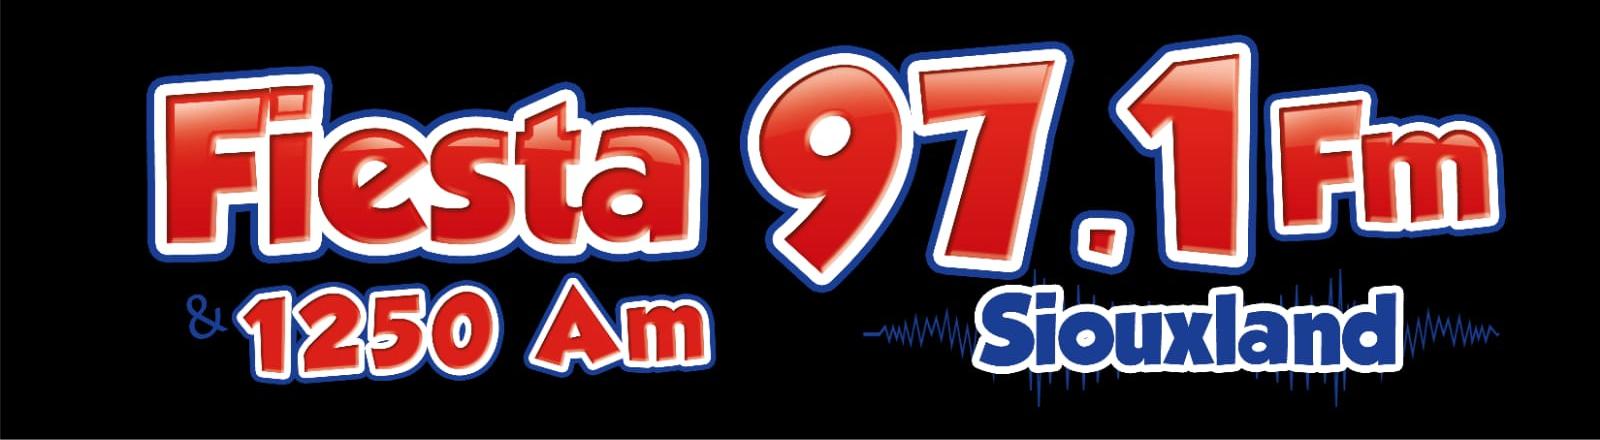 Fiesta 97.1 FM & 1250 AM